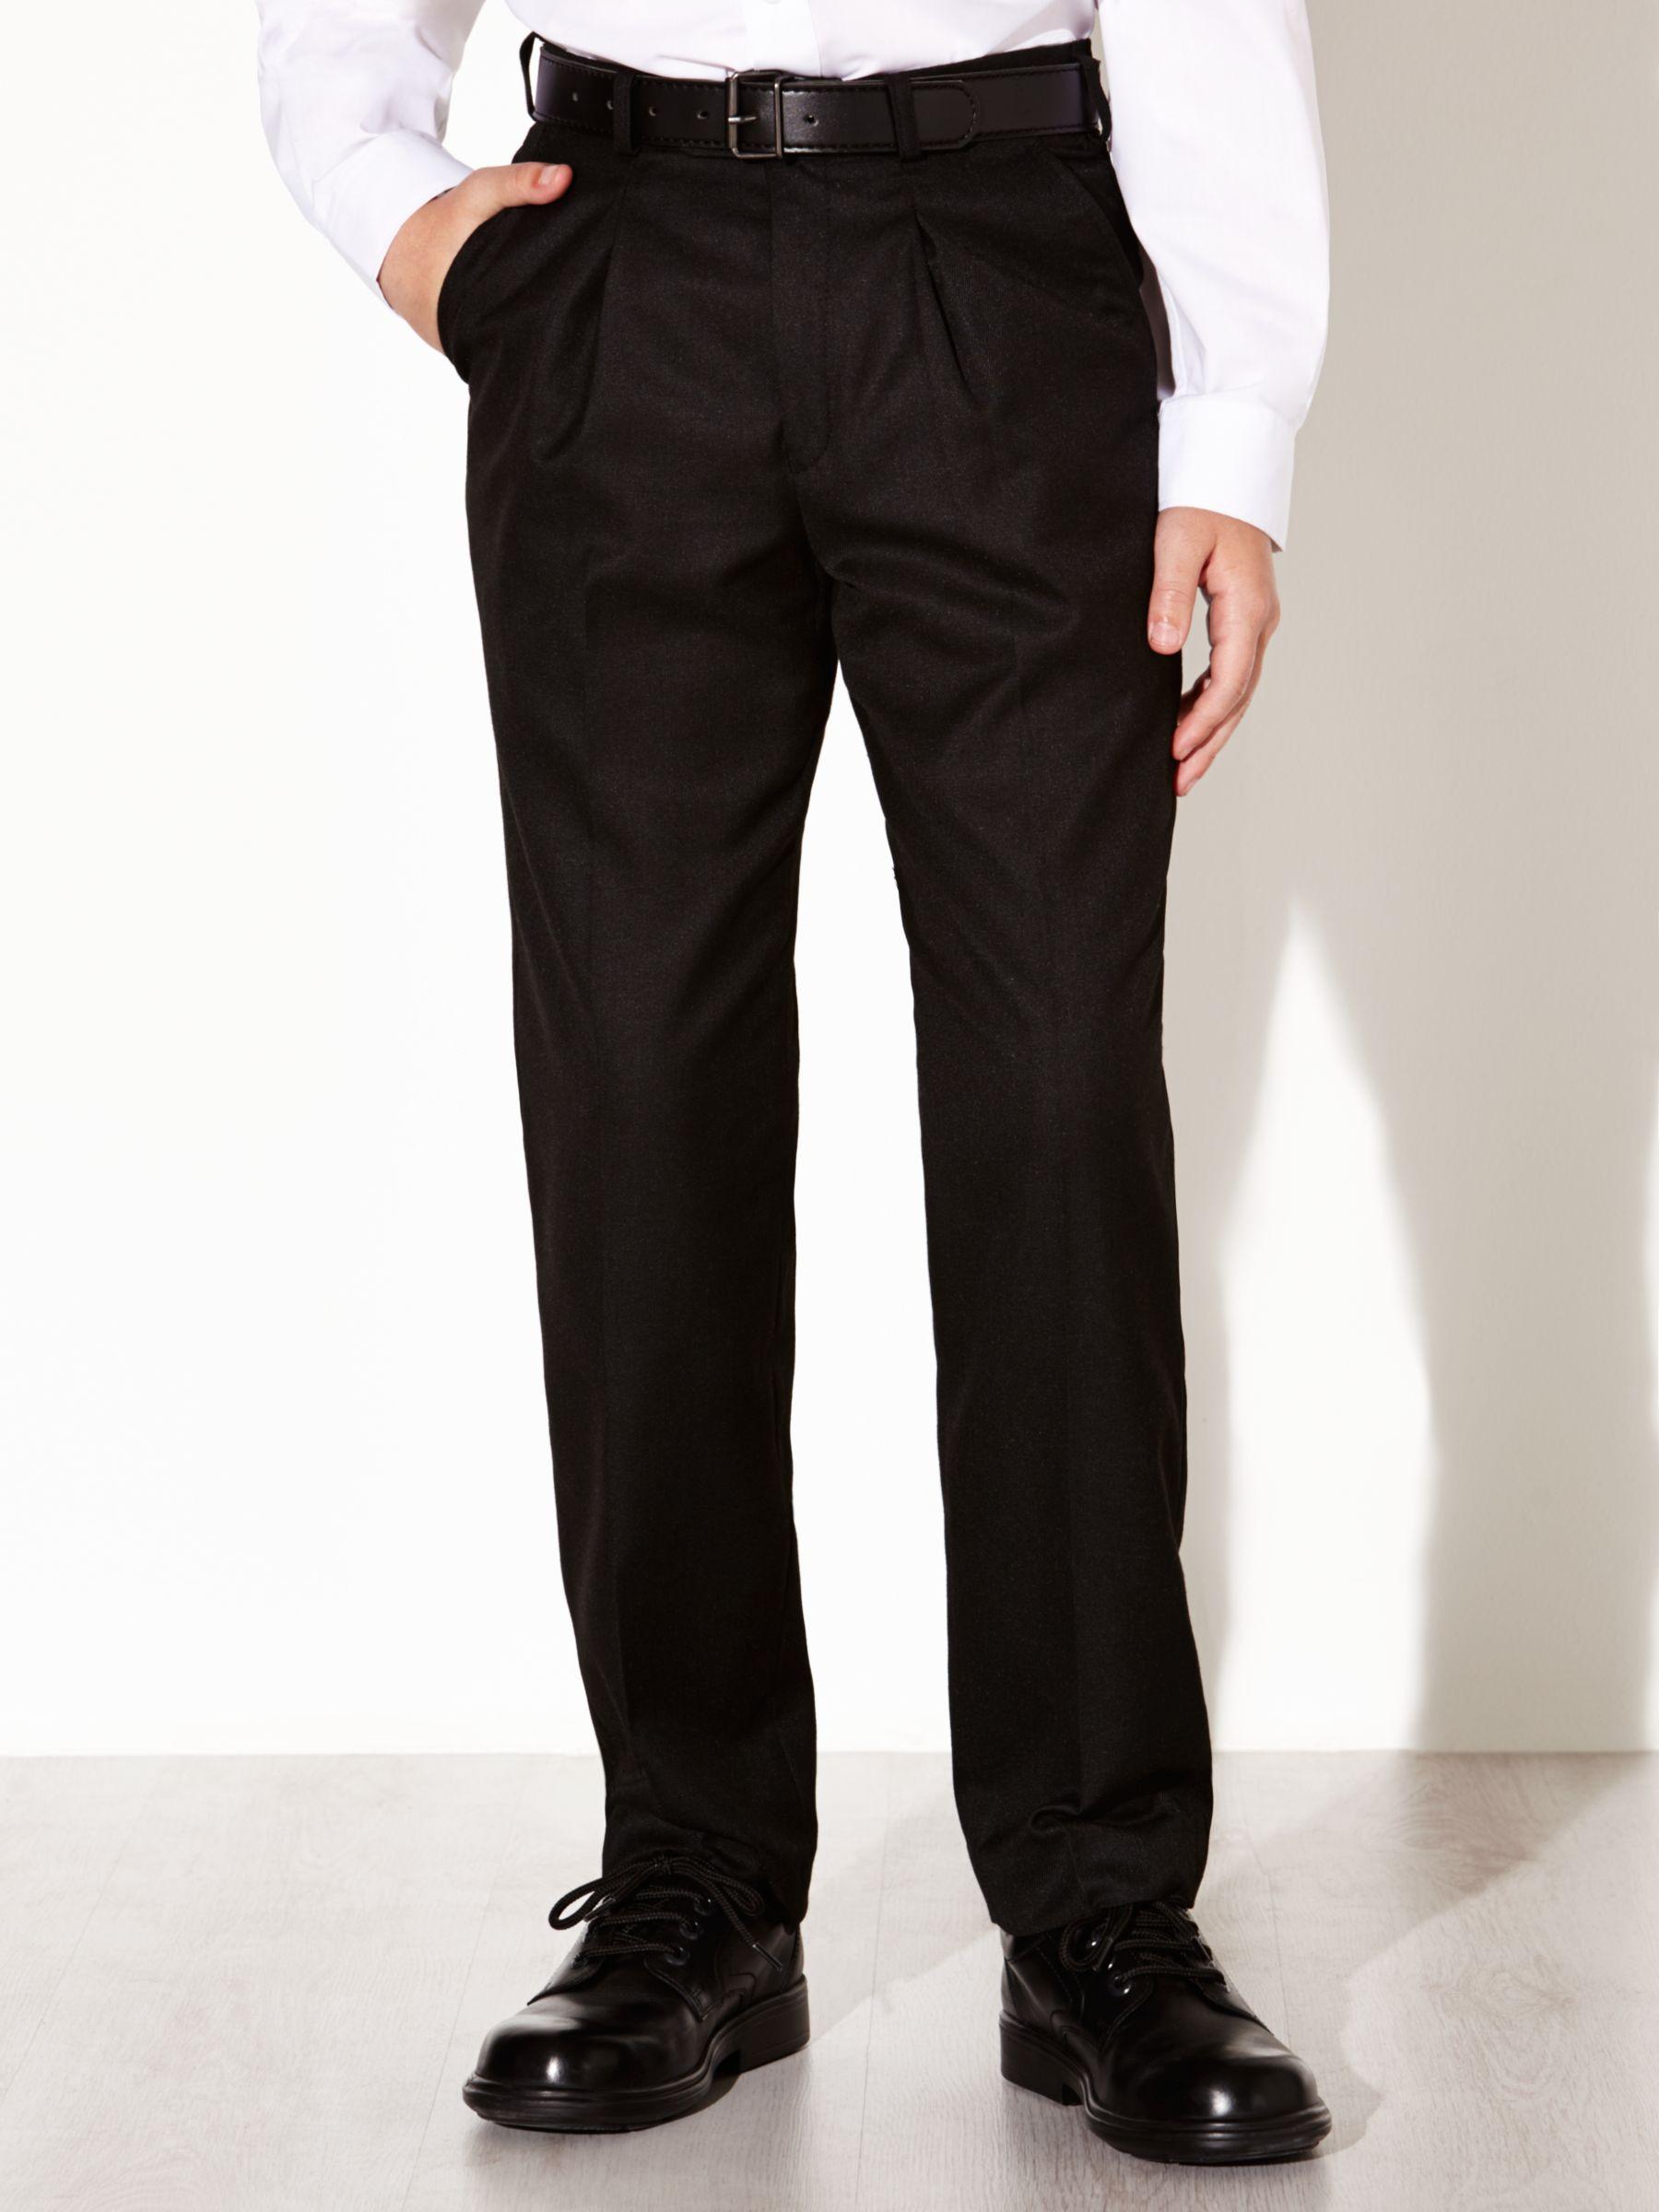 David Luke David Luke Senior Regular Fit Eco-Trousers with Belt